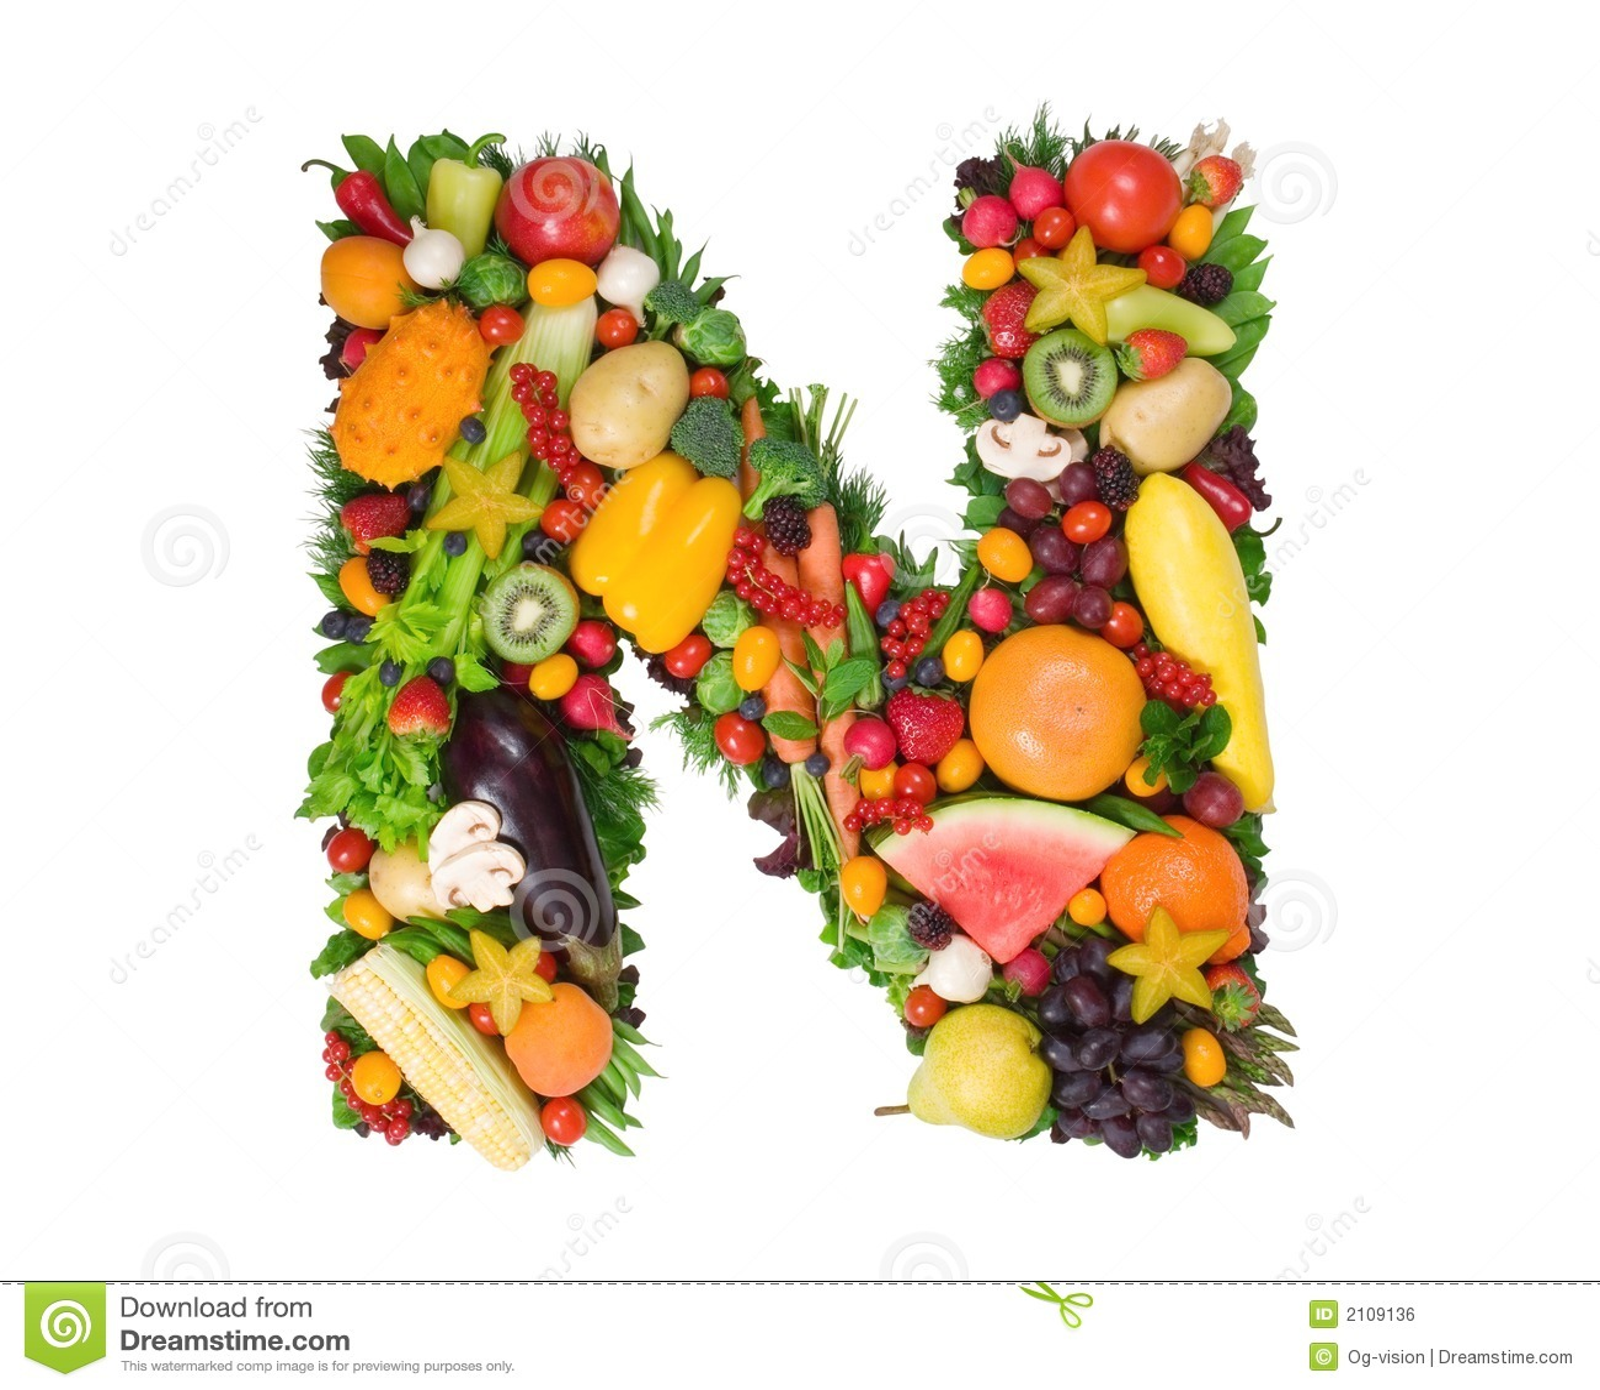 alphabet of health   n stock photo image of kiwi